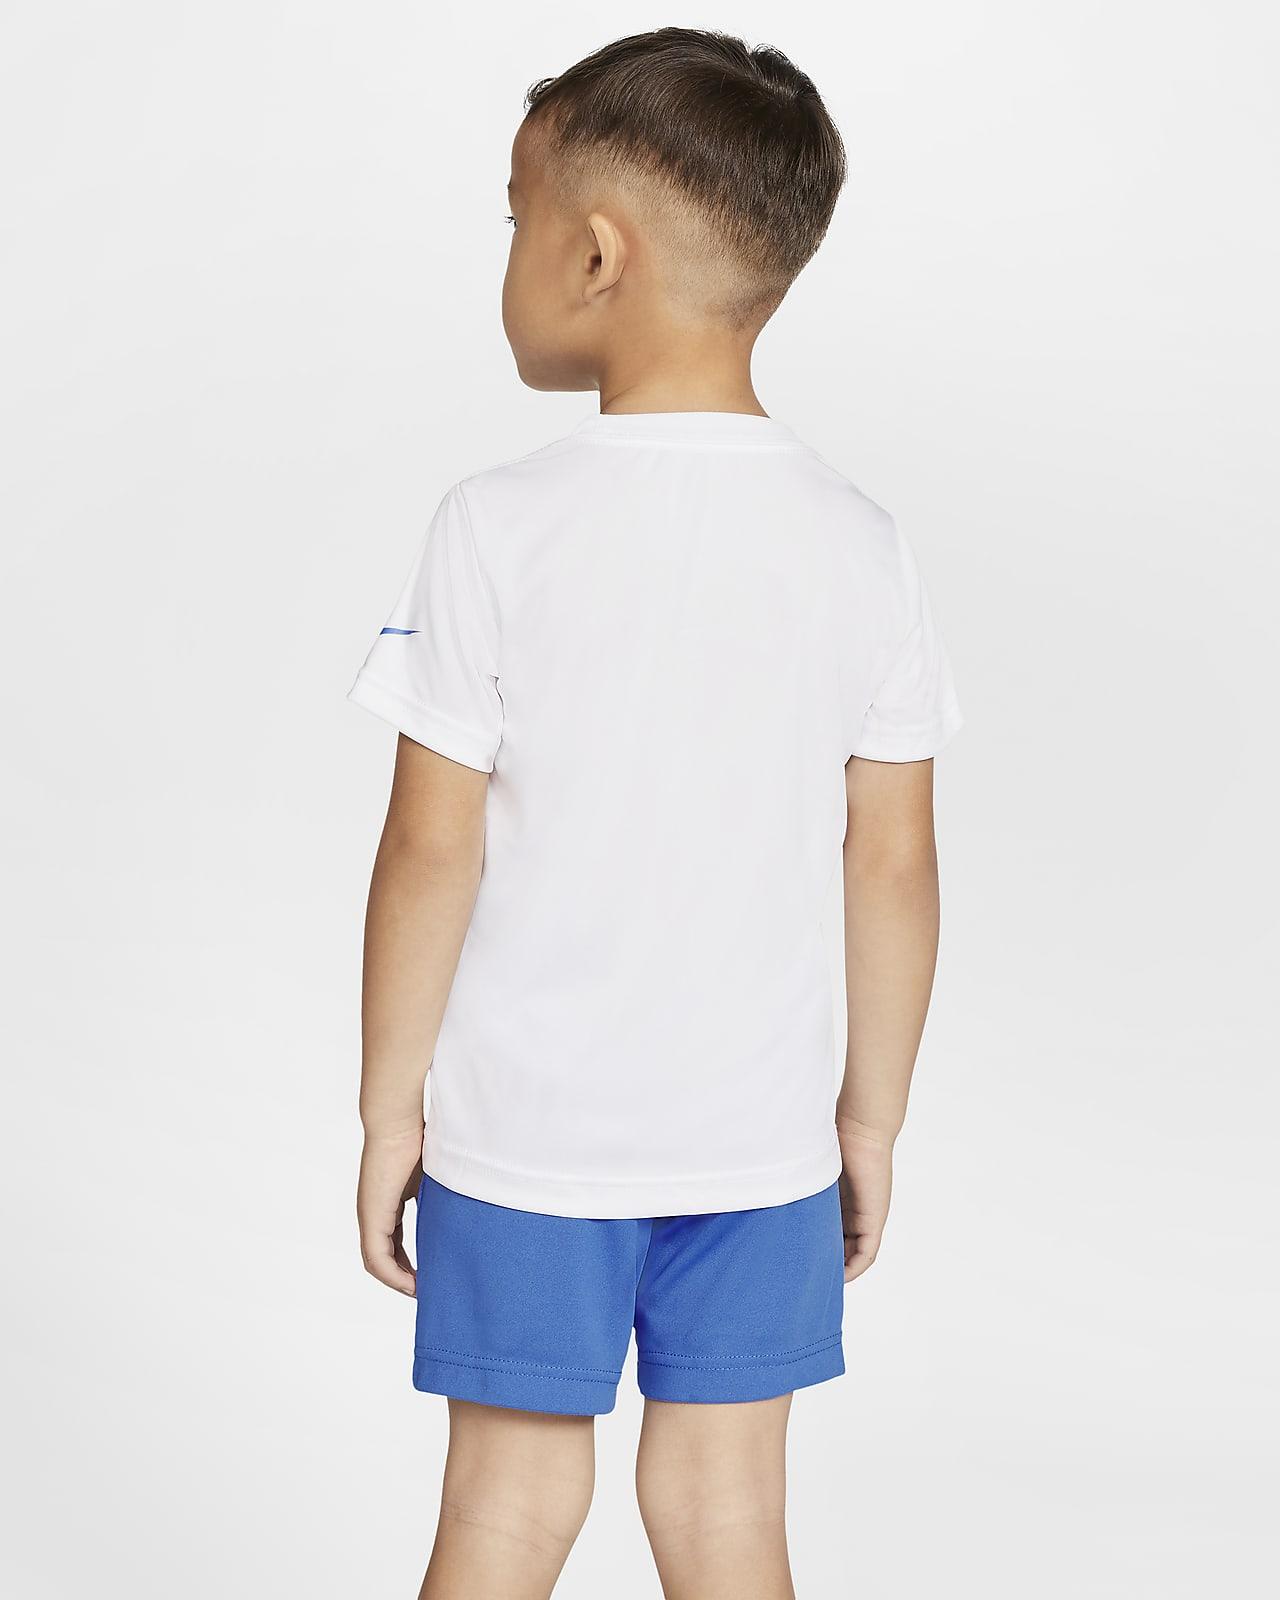 Nike Dri Fit Short Sleeved Shirt 4T 3T Size 2T Gift $20 Boys Basketball